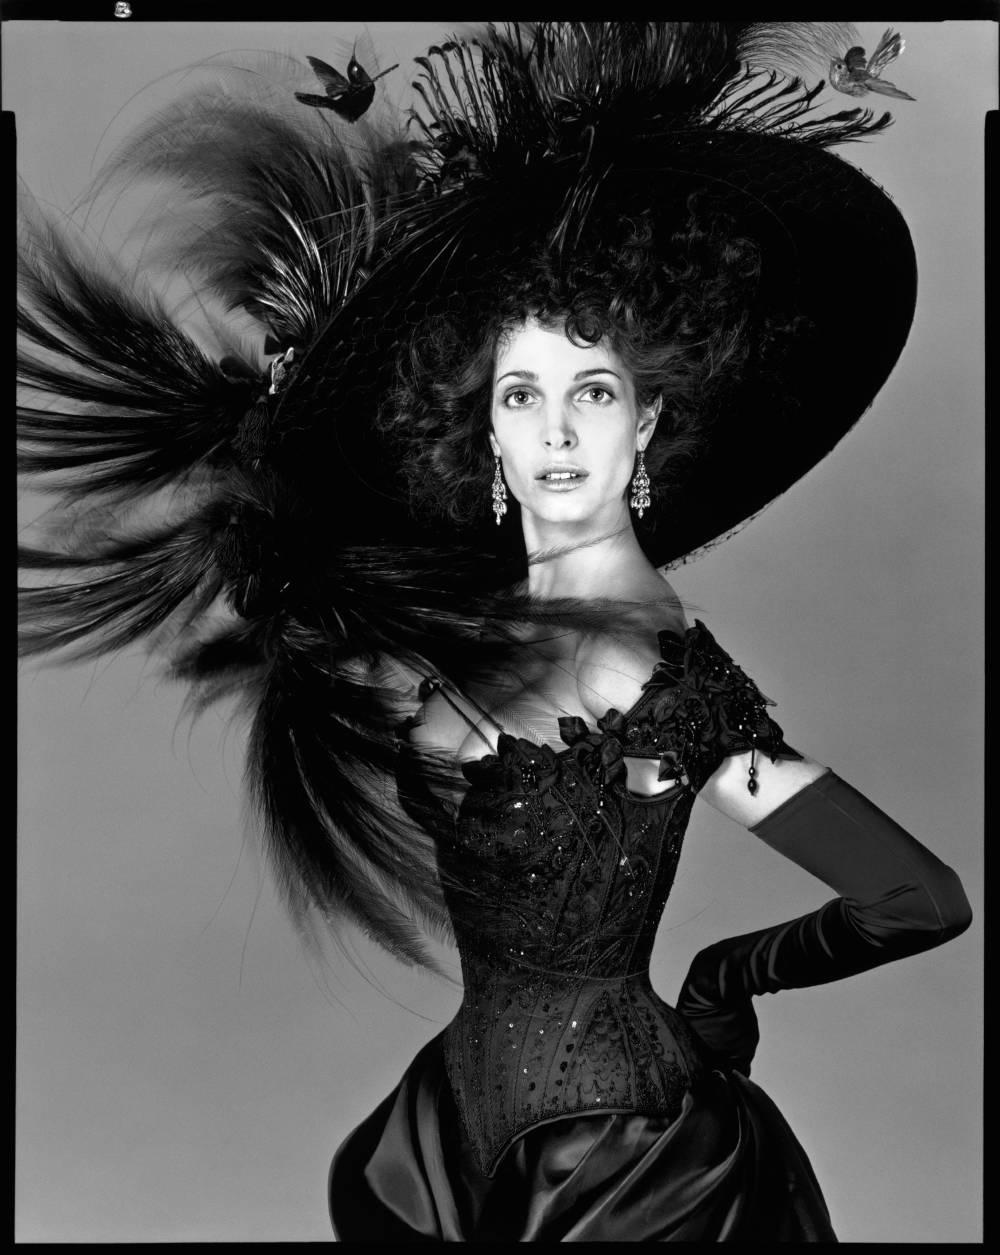 Stephanie Seymour, bustier by Pearl, hat by Philip Treacy, New York